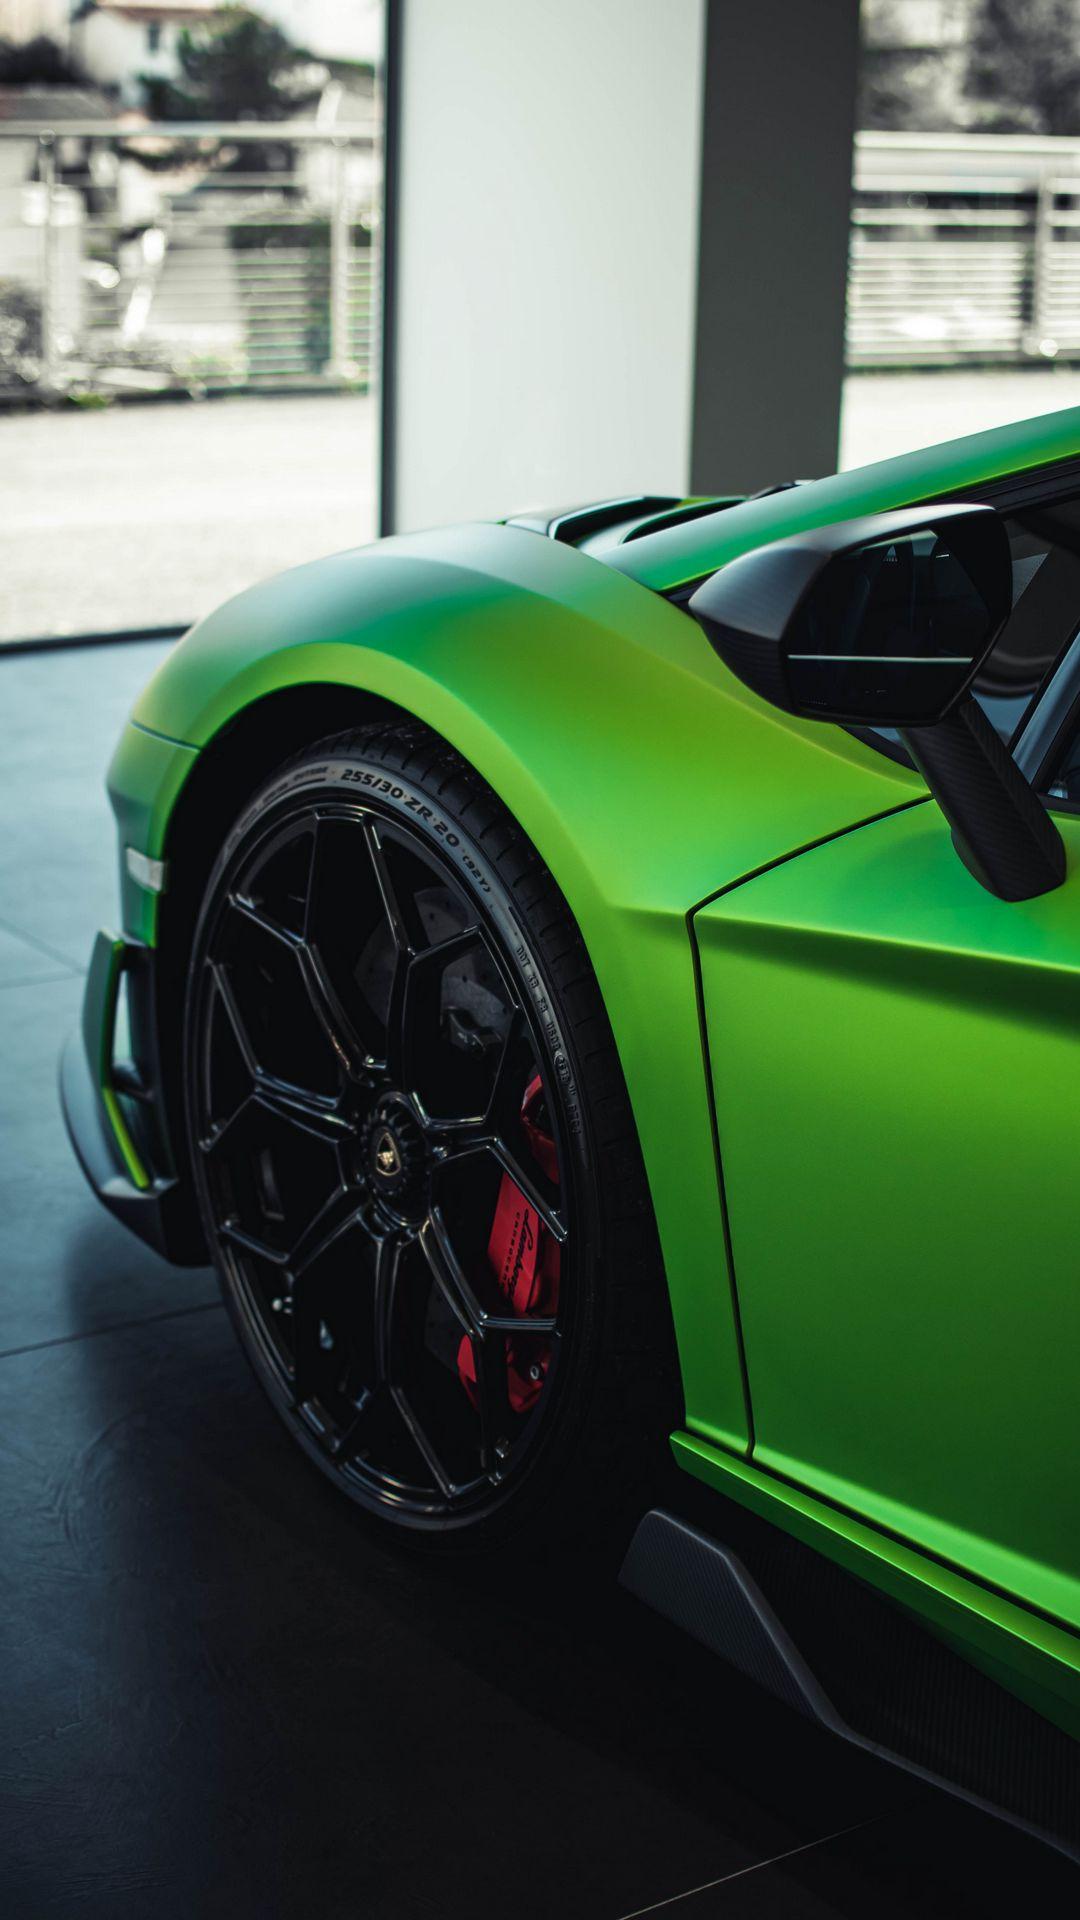 Lamborghini Luxury HD Wallpapers Free Download